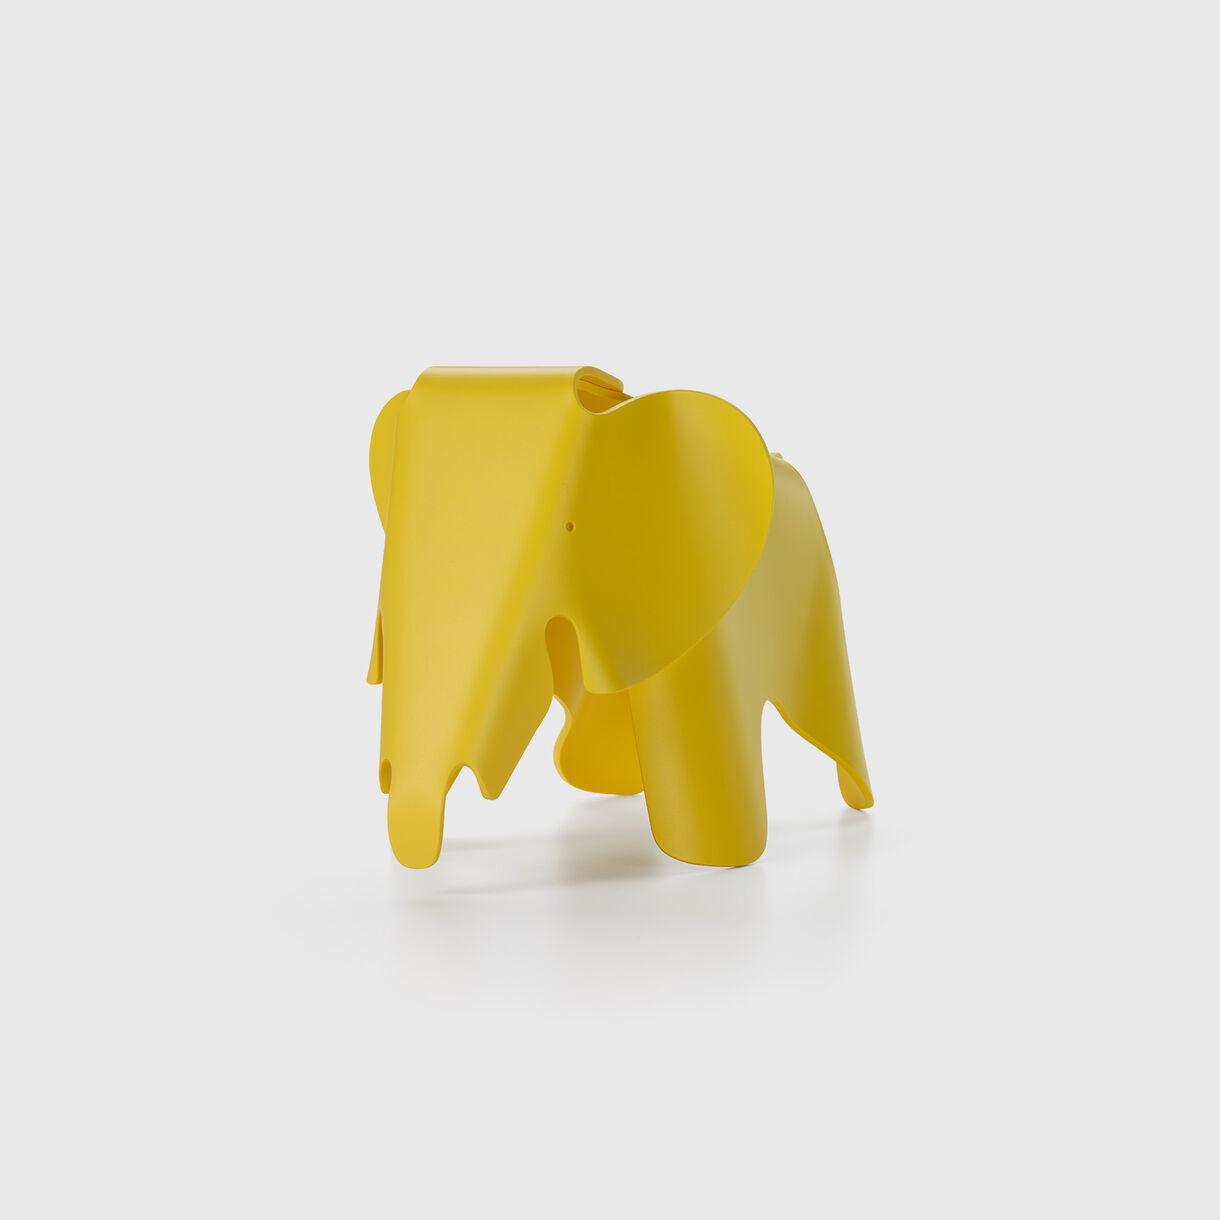 Eames Elephant Small, Buttercup